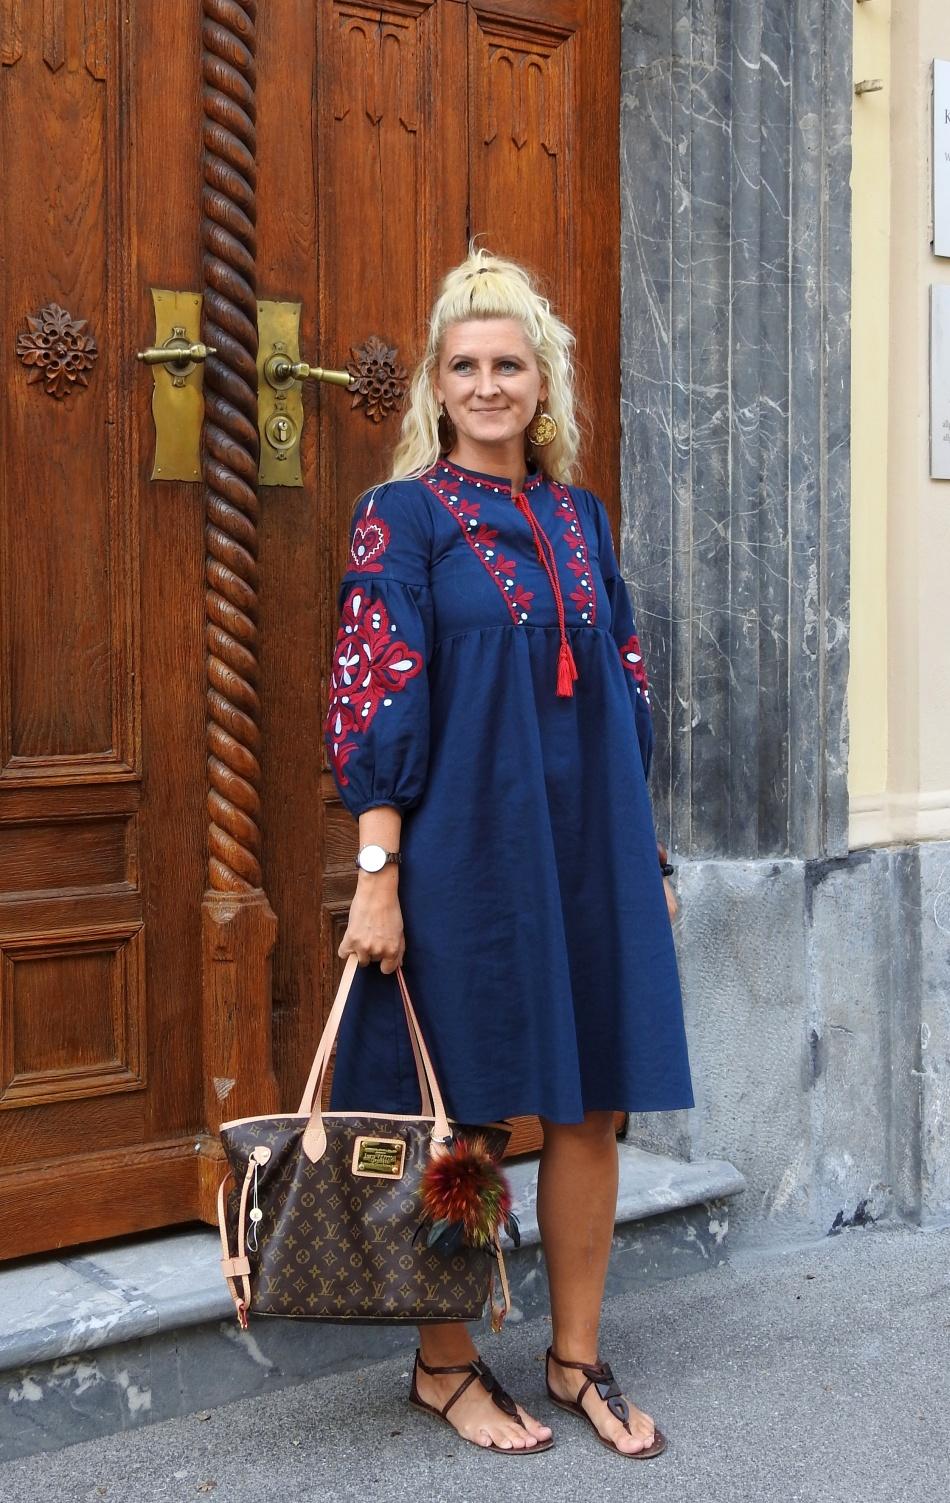 Embroidered-Dress-Louis-Vuitton-Bag-Sandals-carrieslifestyle-Tamara-Prutsch-Zaful